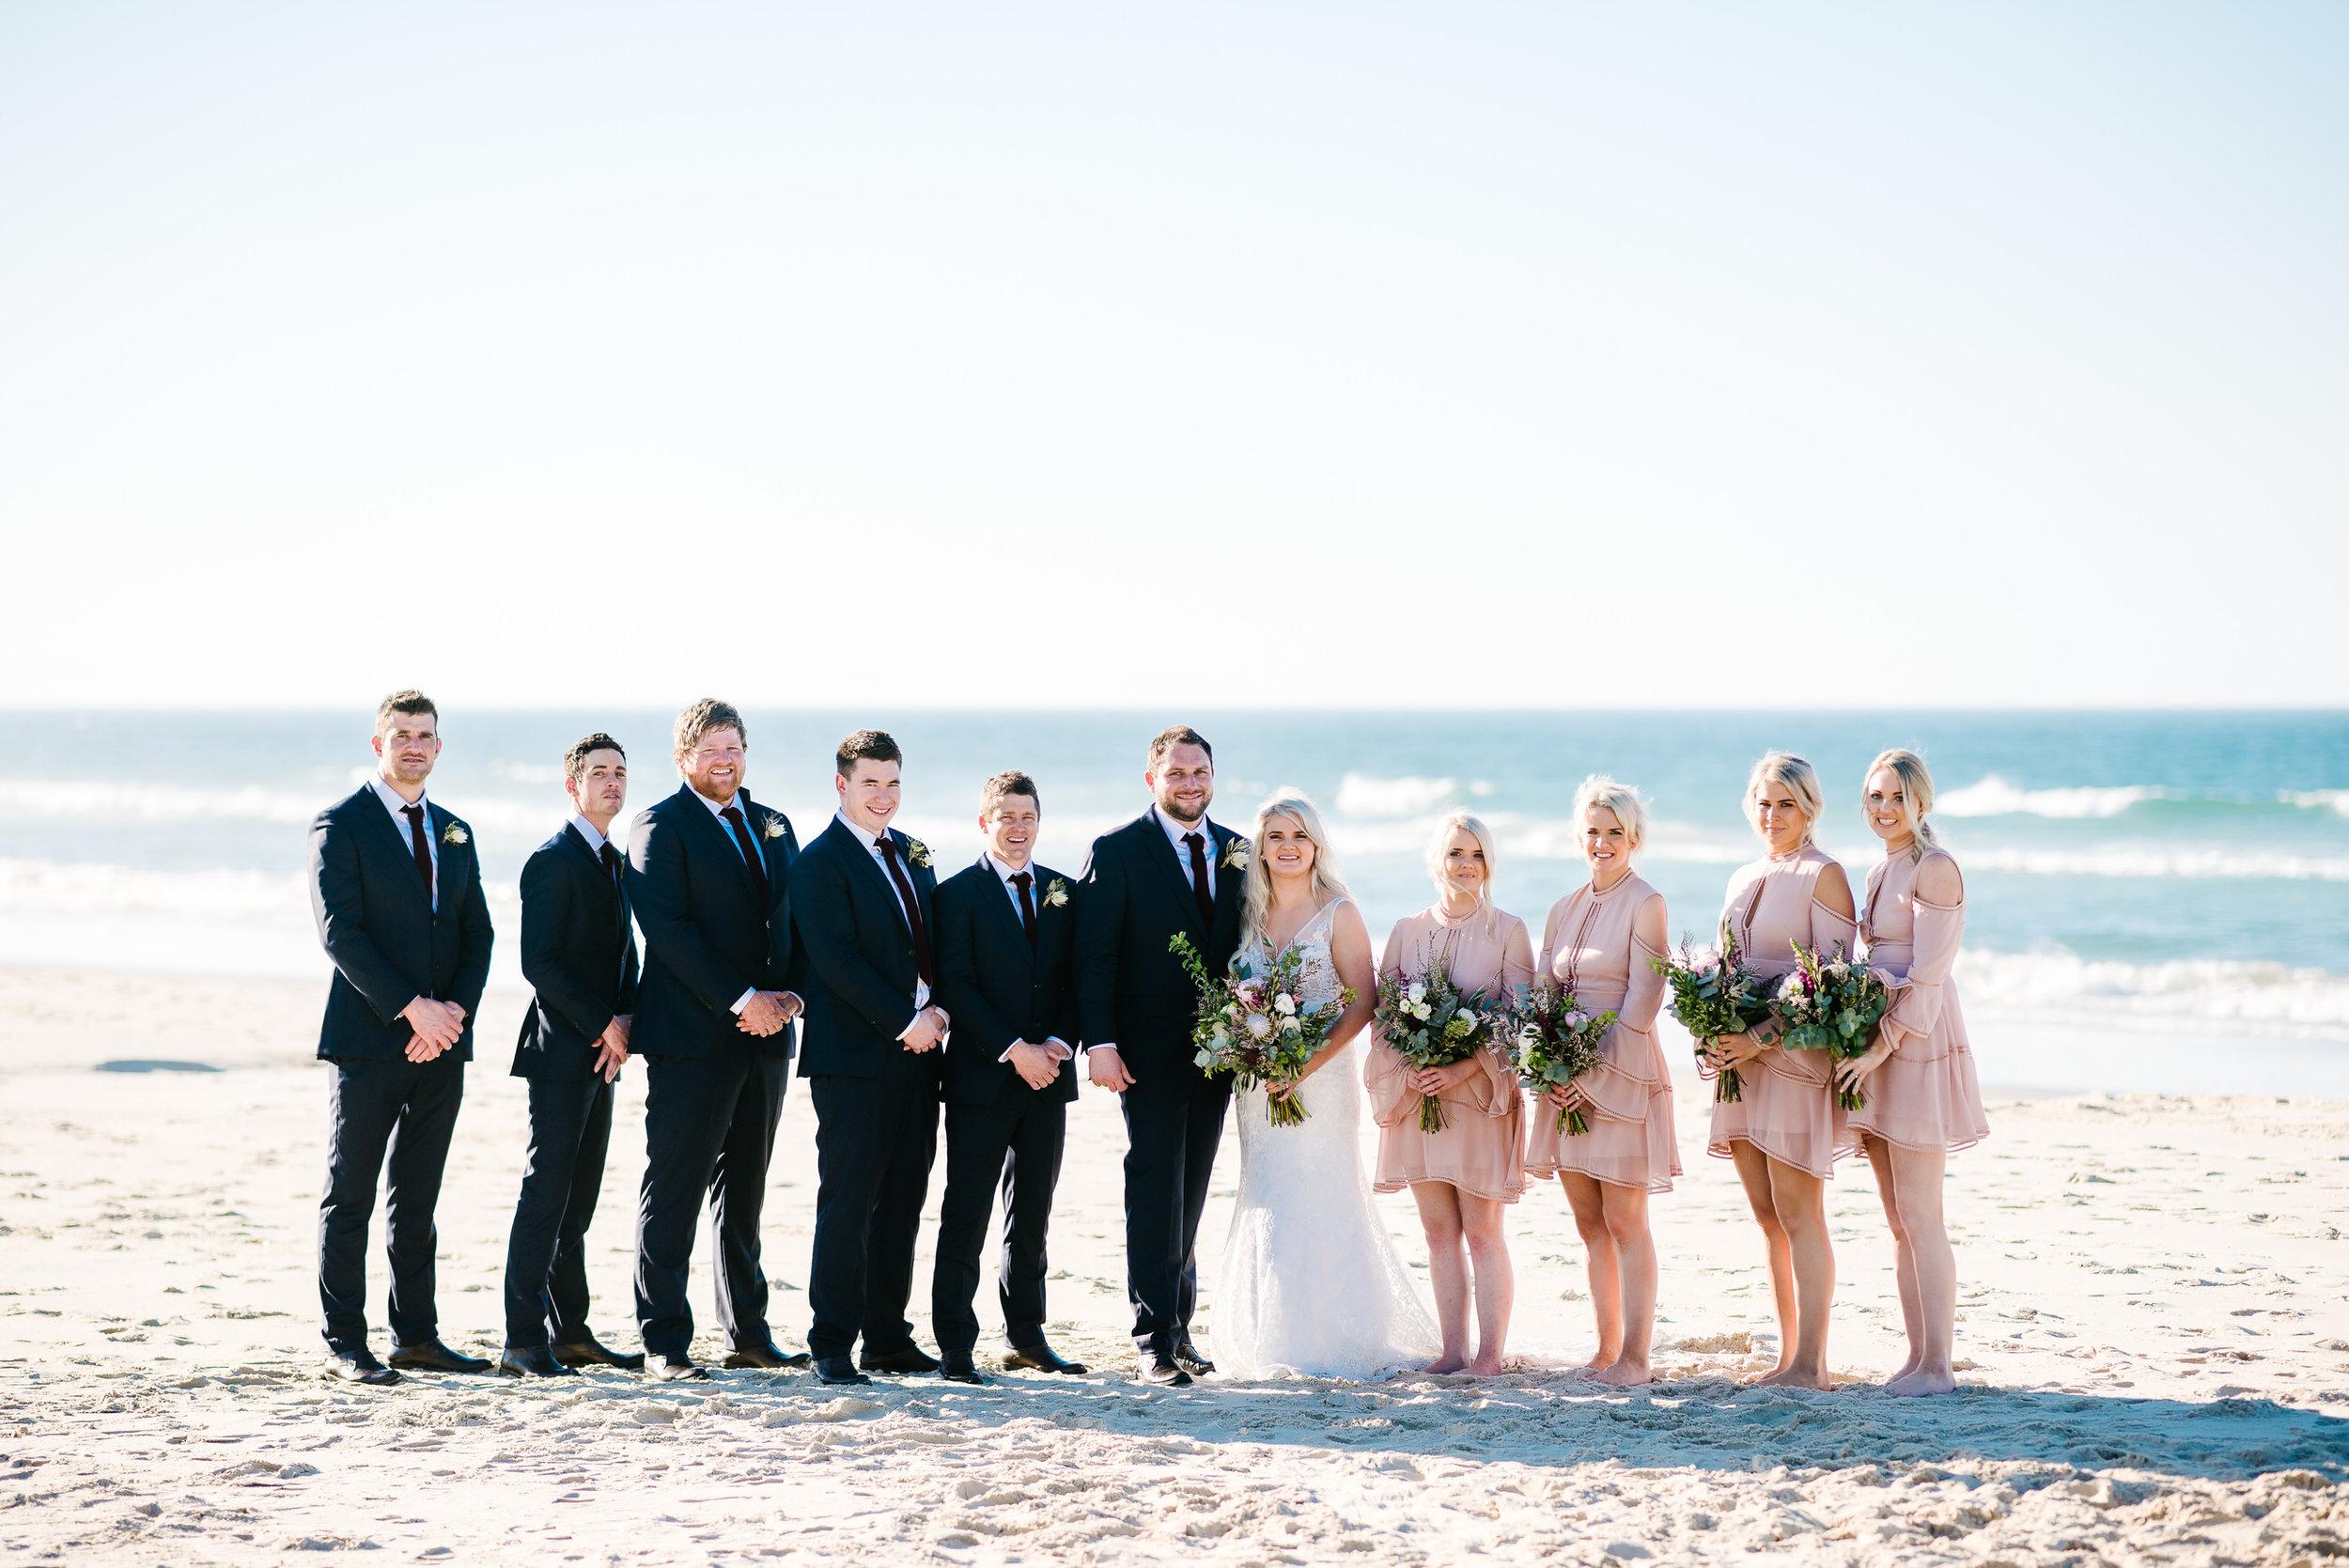 Justin_And_Jim_Photography_Byron_Bay_Wedding065.JPG